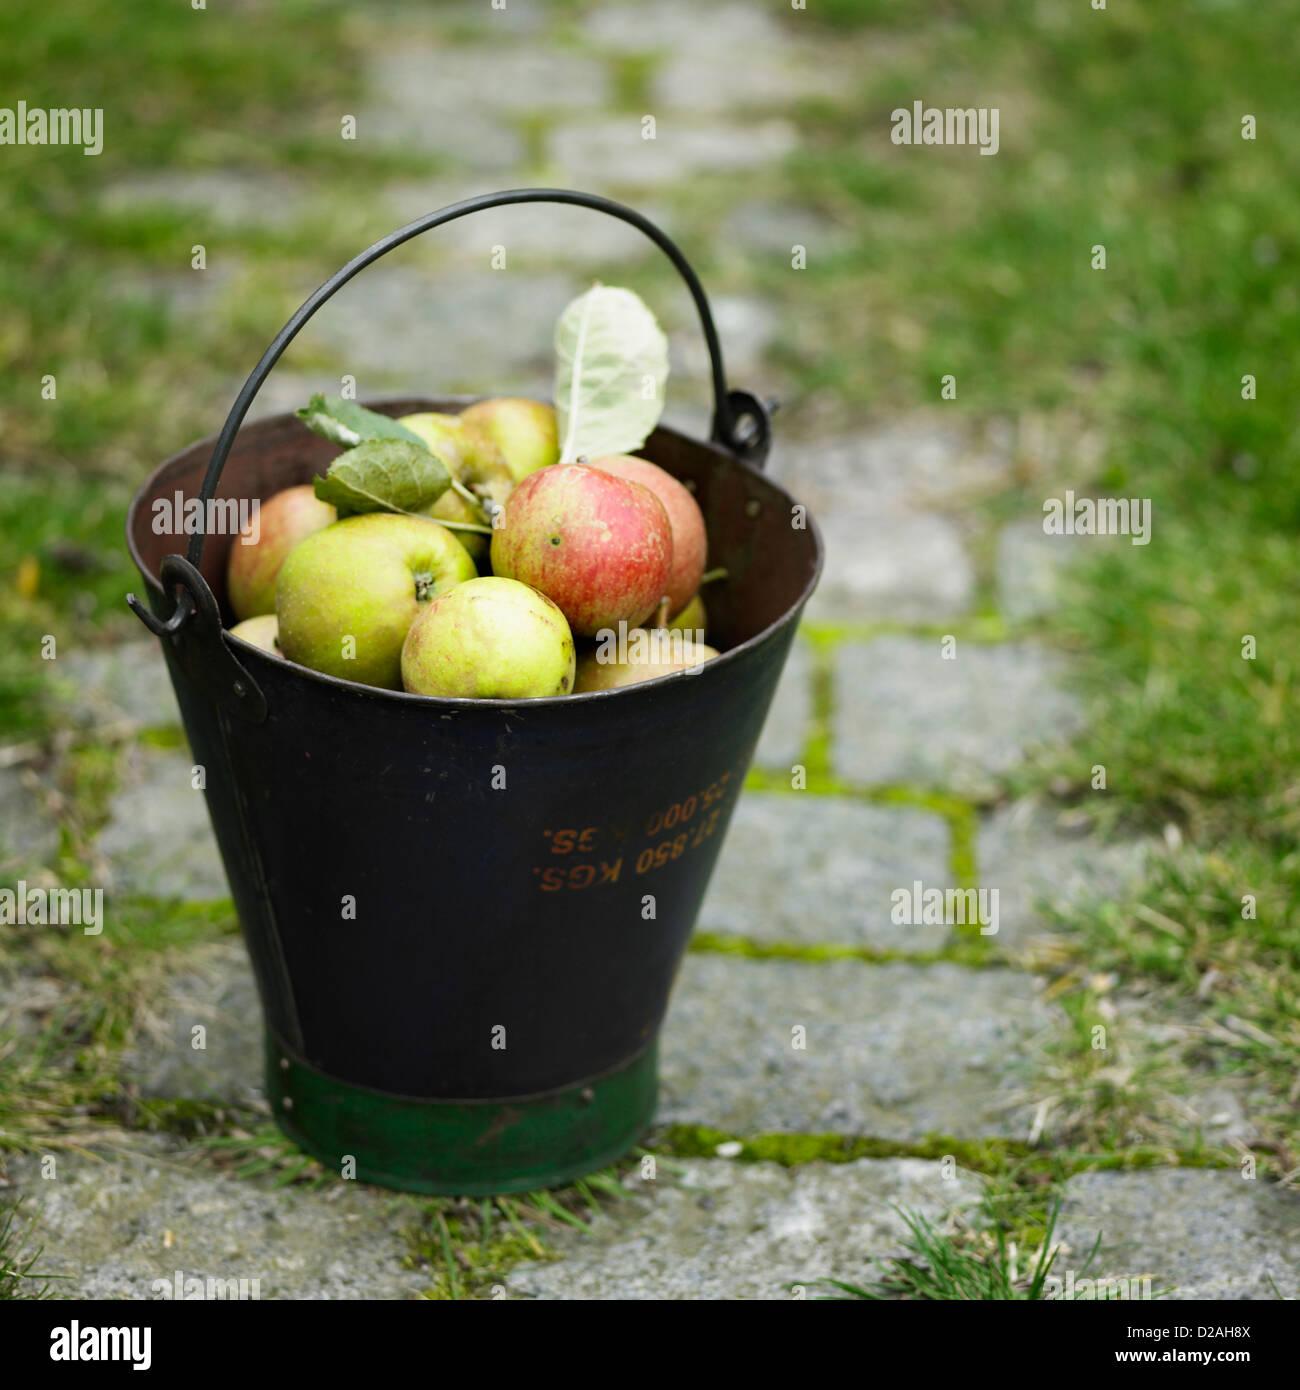 Pail of apples on cobblestone walk - Stock Image